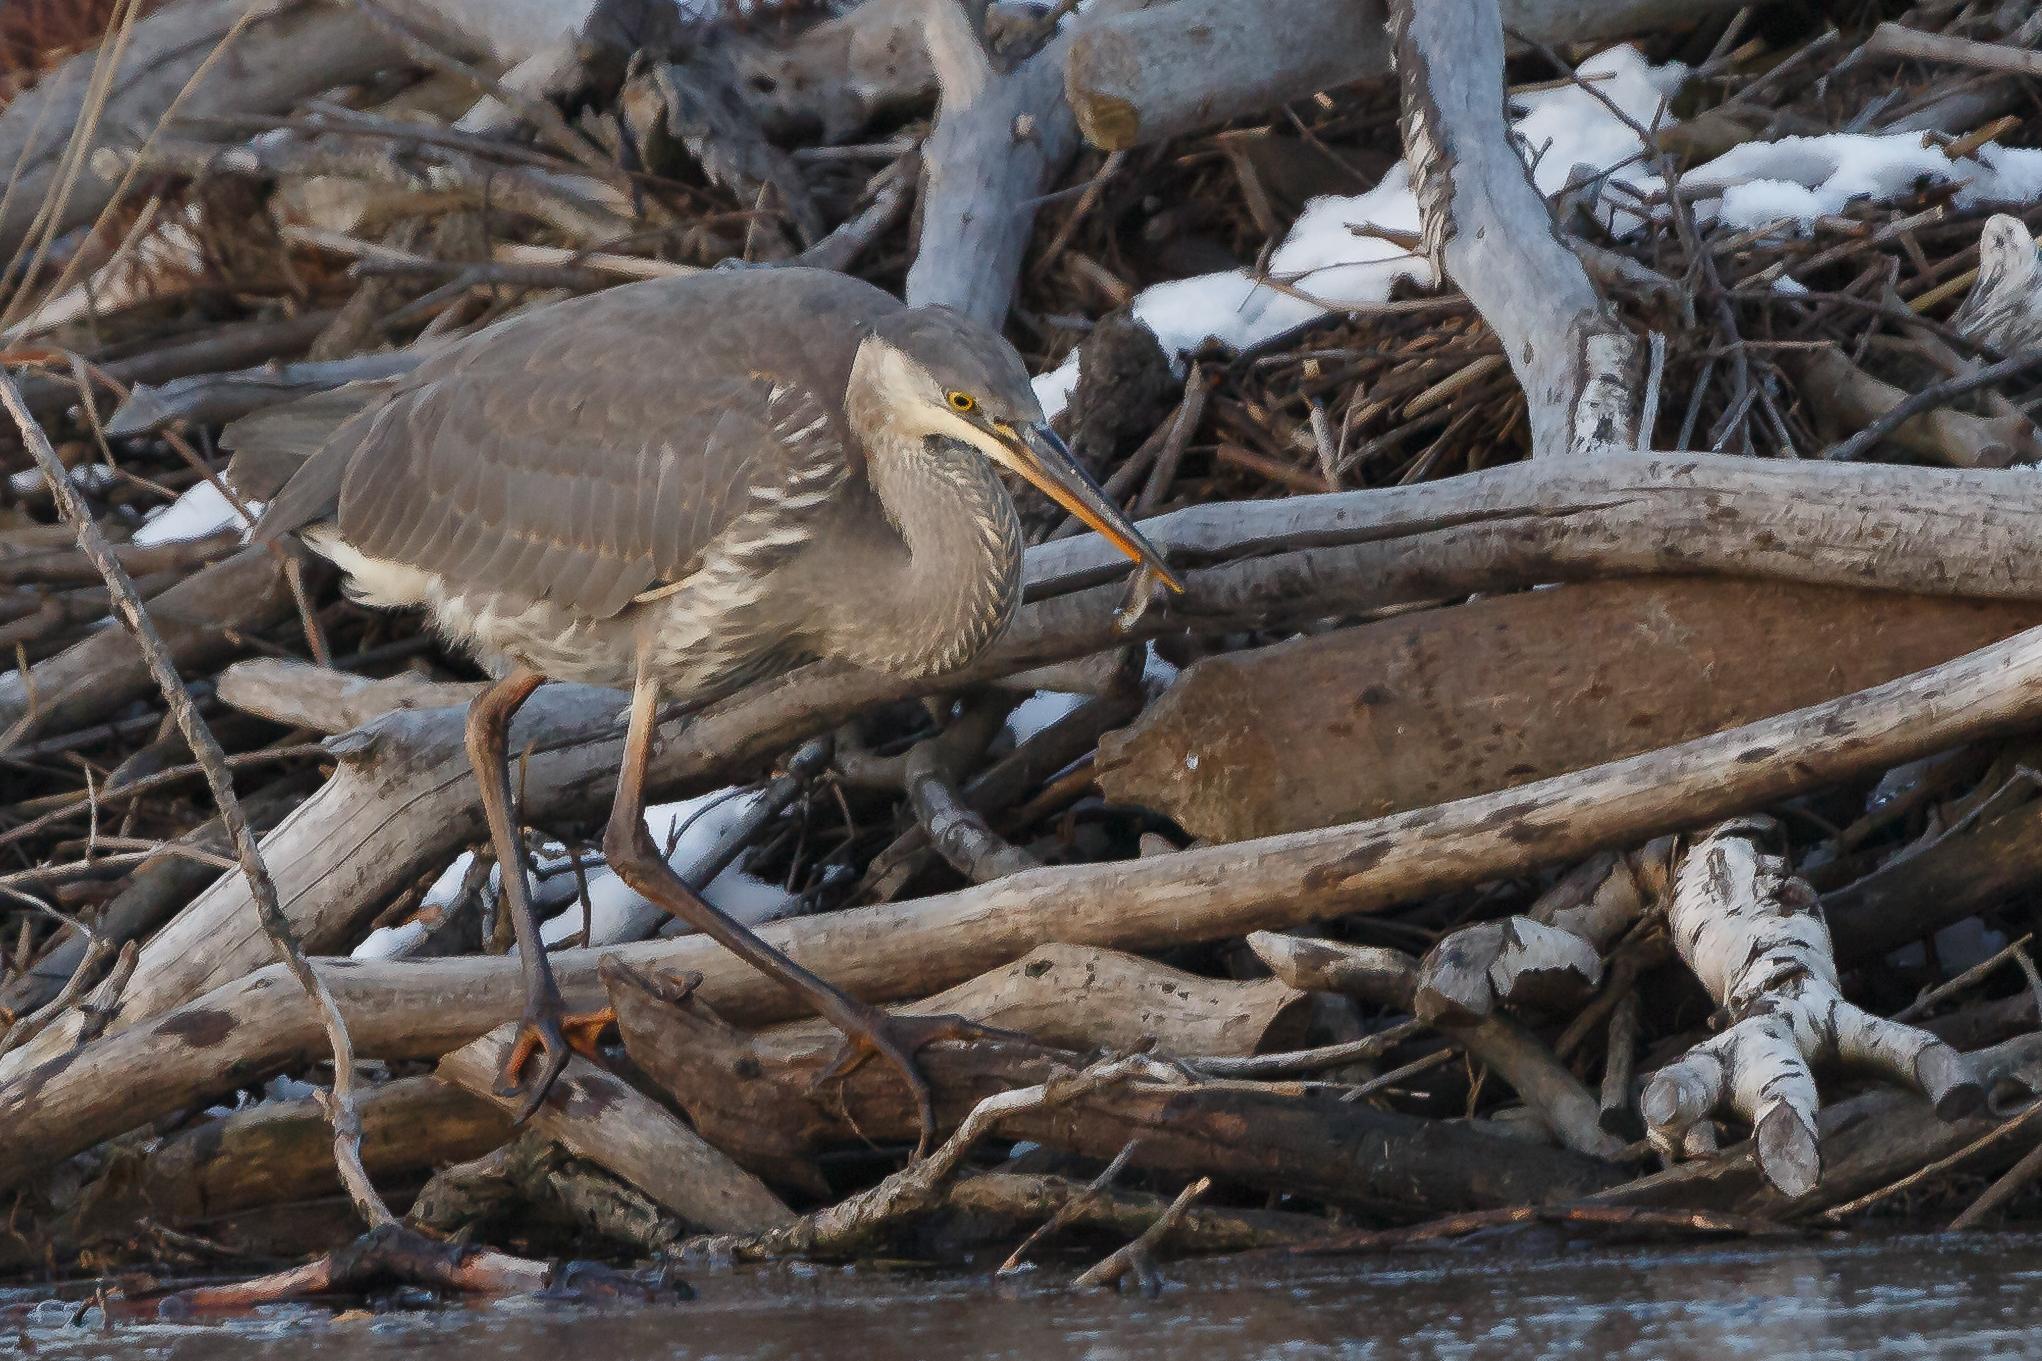 Heron - Image by Gary Detonnancourt